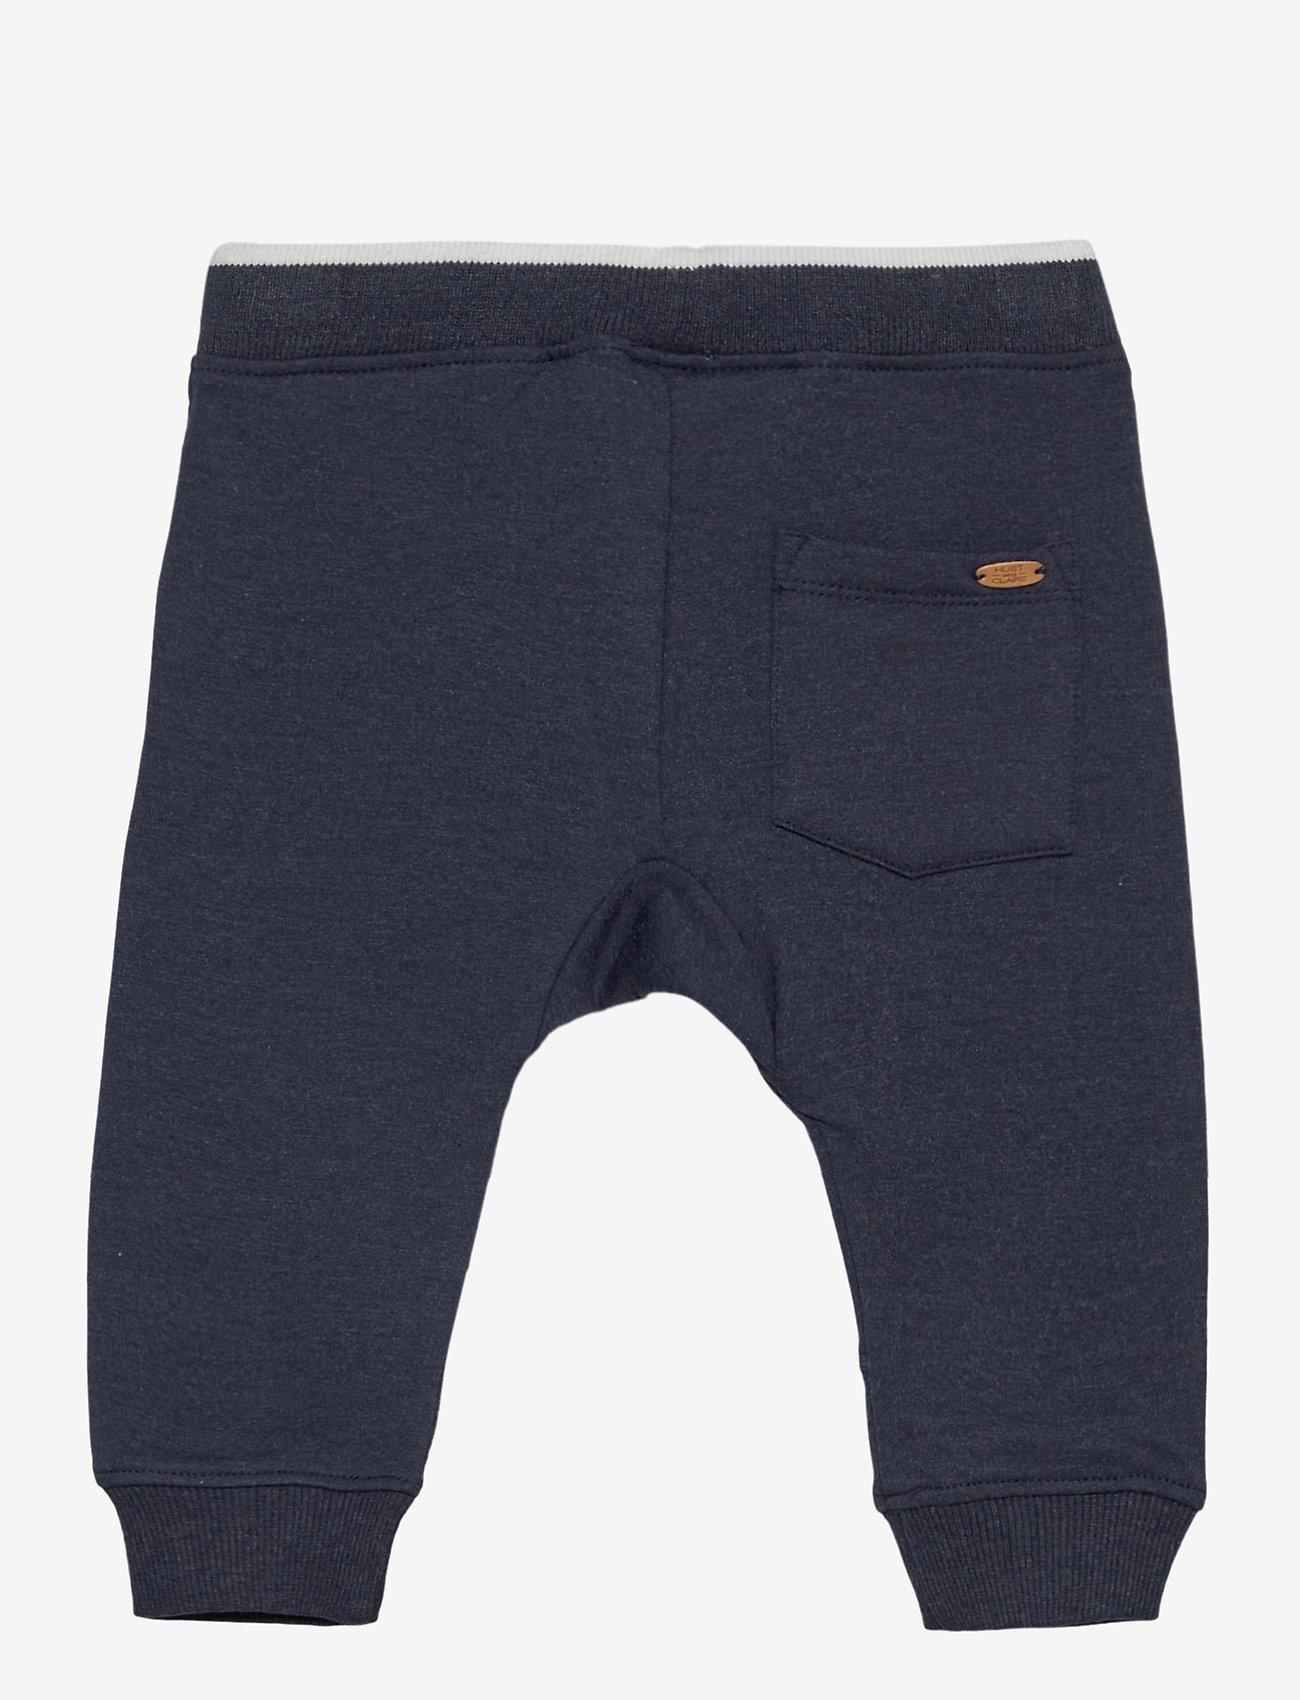 Gorm - Jogging Trousers (Navy) (34.95 €) - Hust & Claire GRQAu